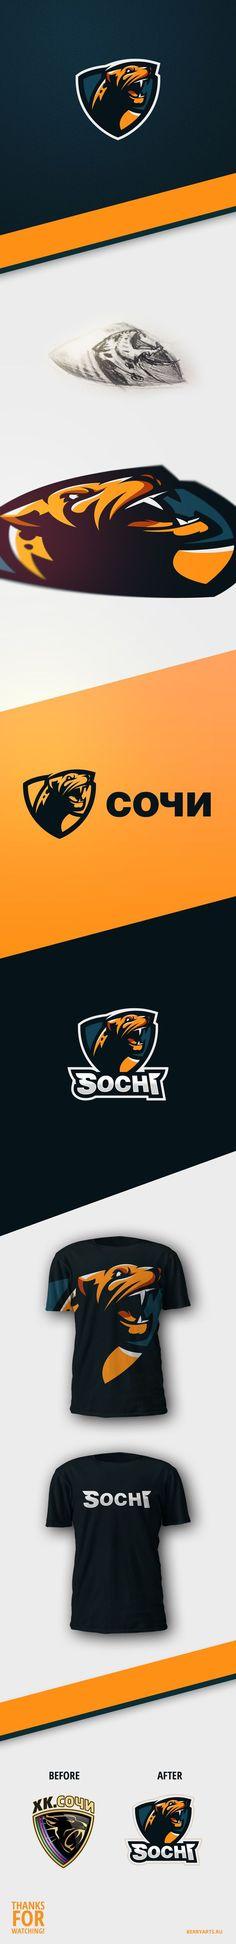 Leopard logo - for sale on Behance: